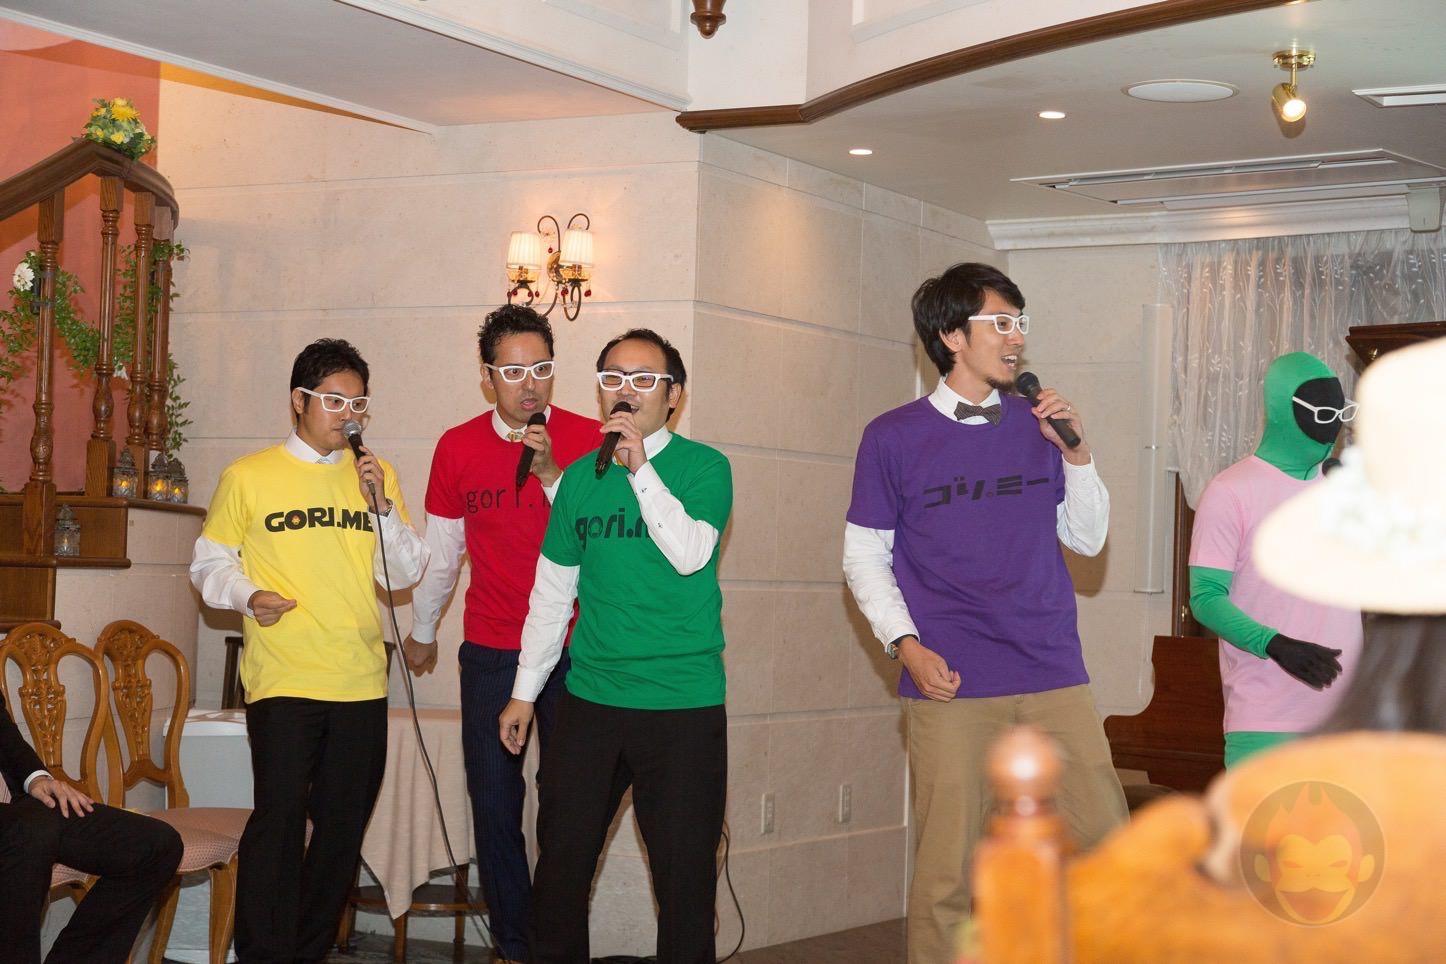 GoriMe-Wedding-Ting-Tong-Dessert-002.jpg